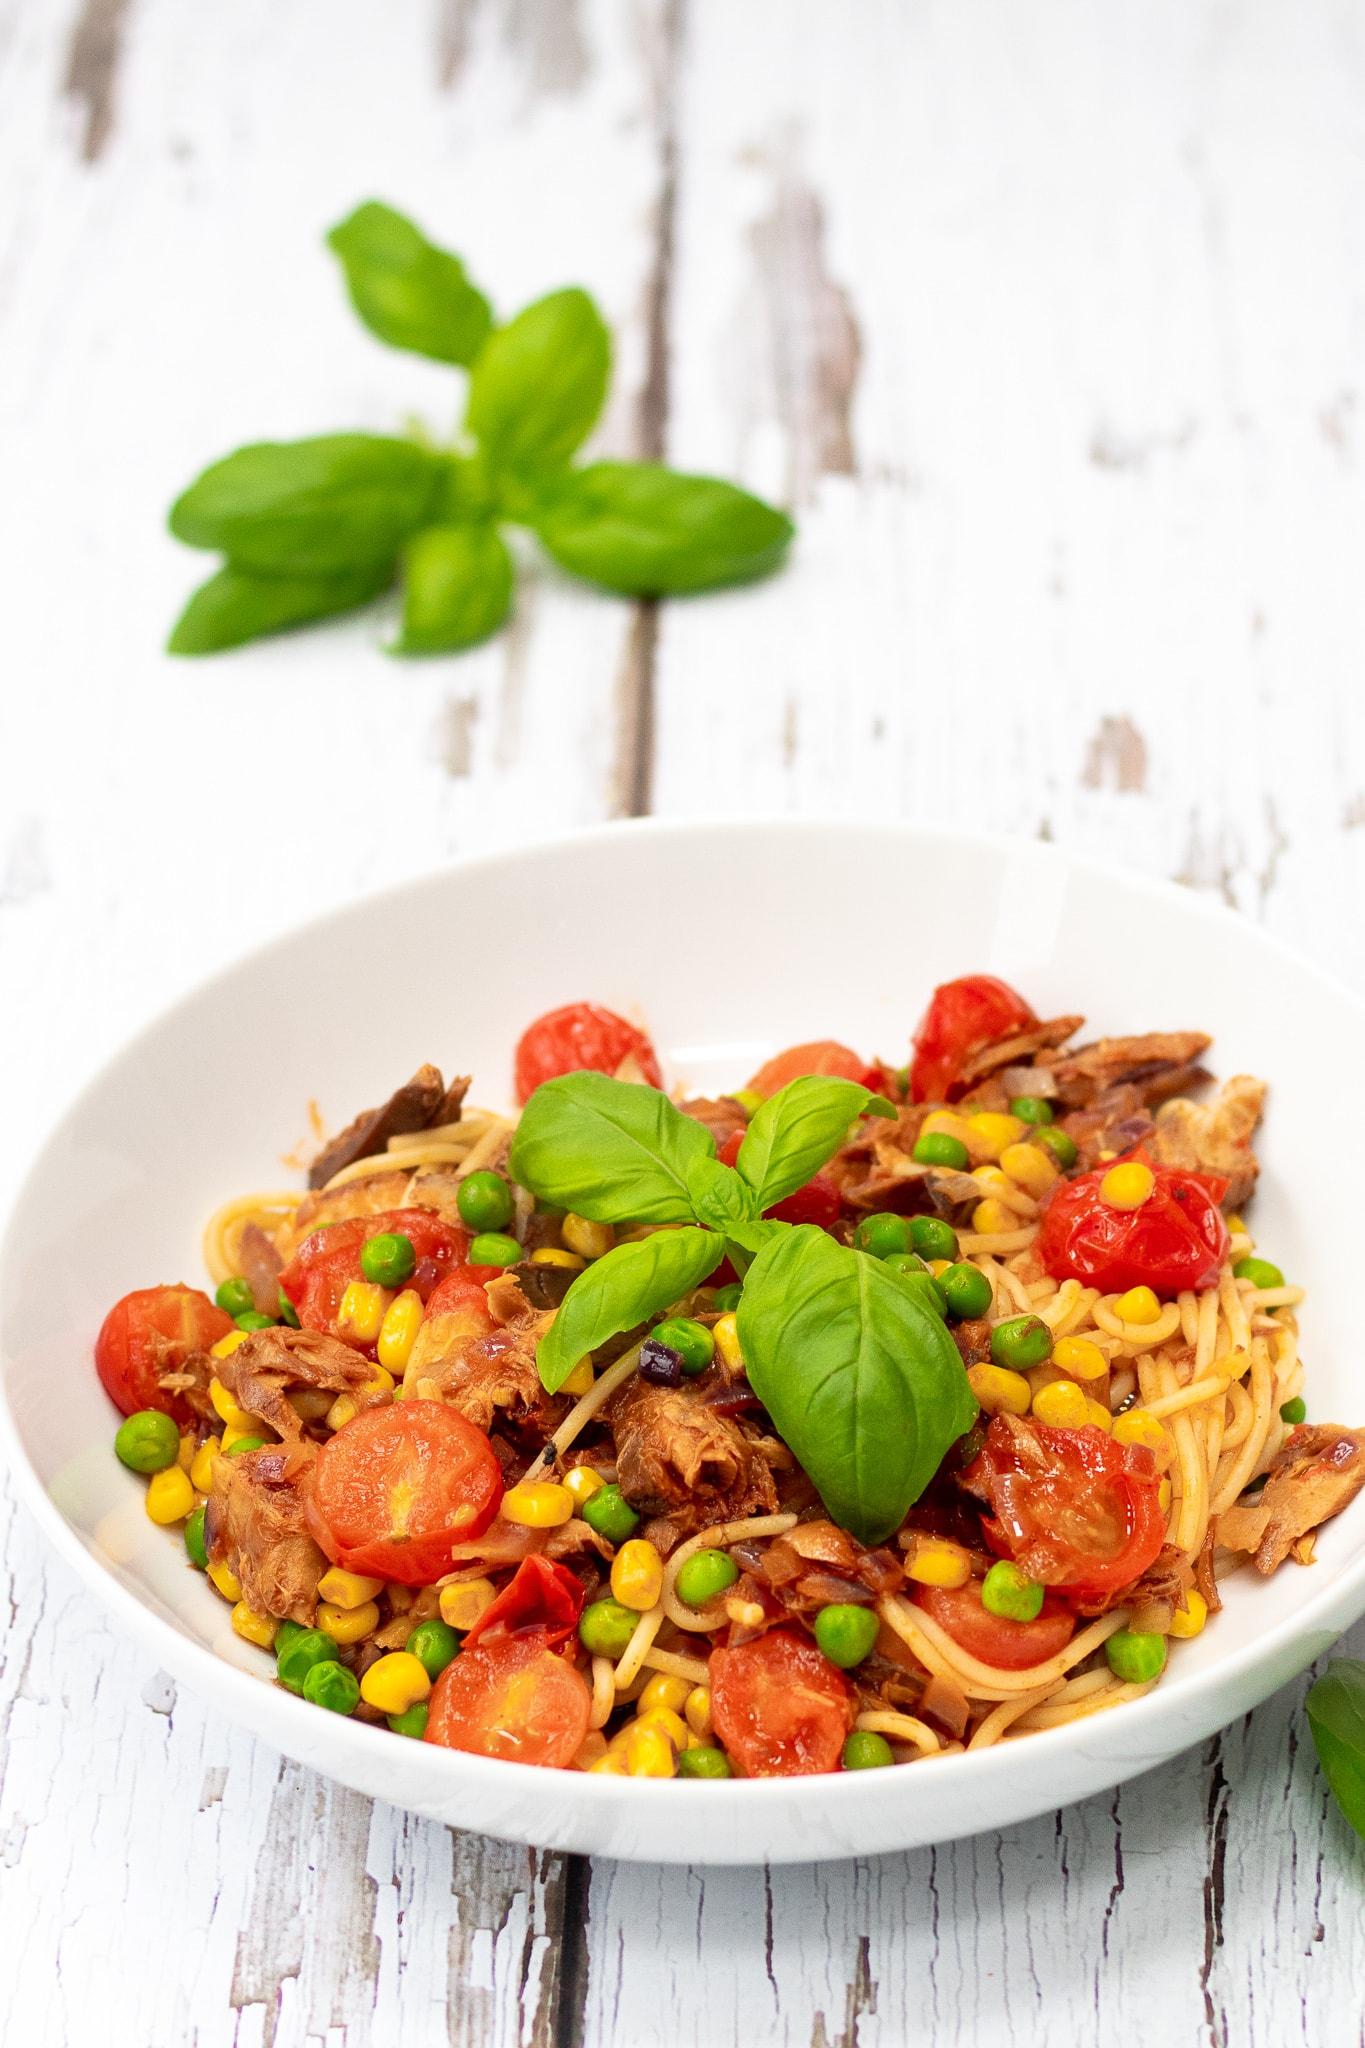 tinned mackerel pasta recipe in a bowl